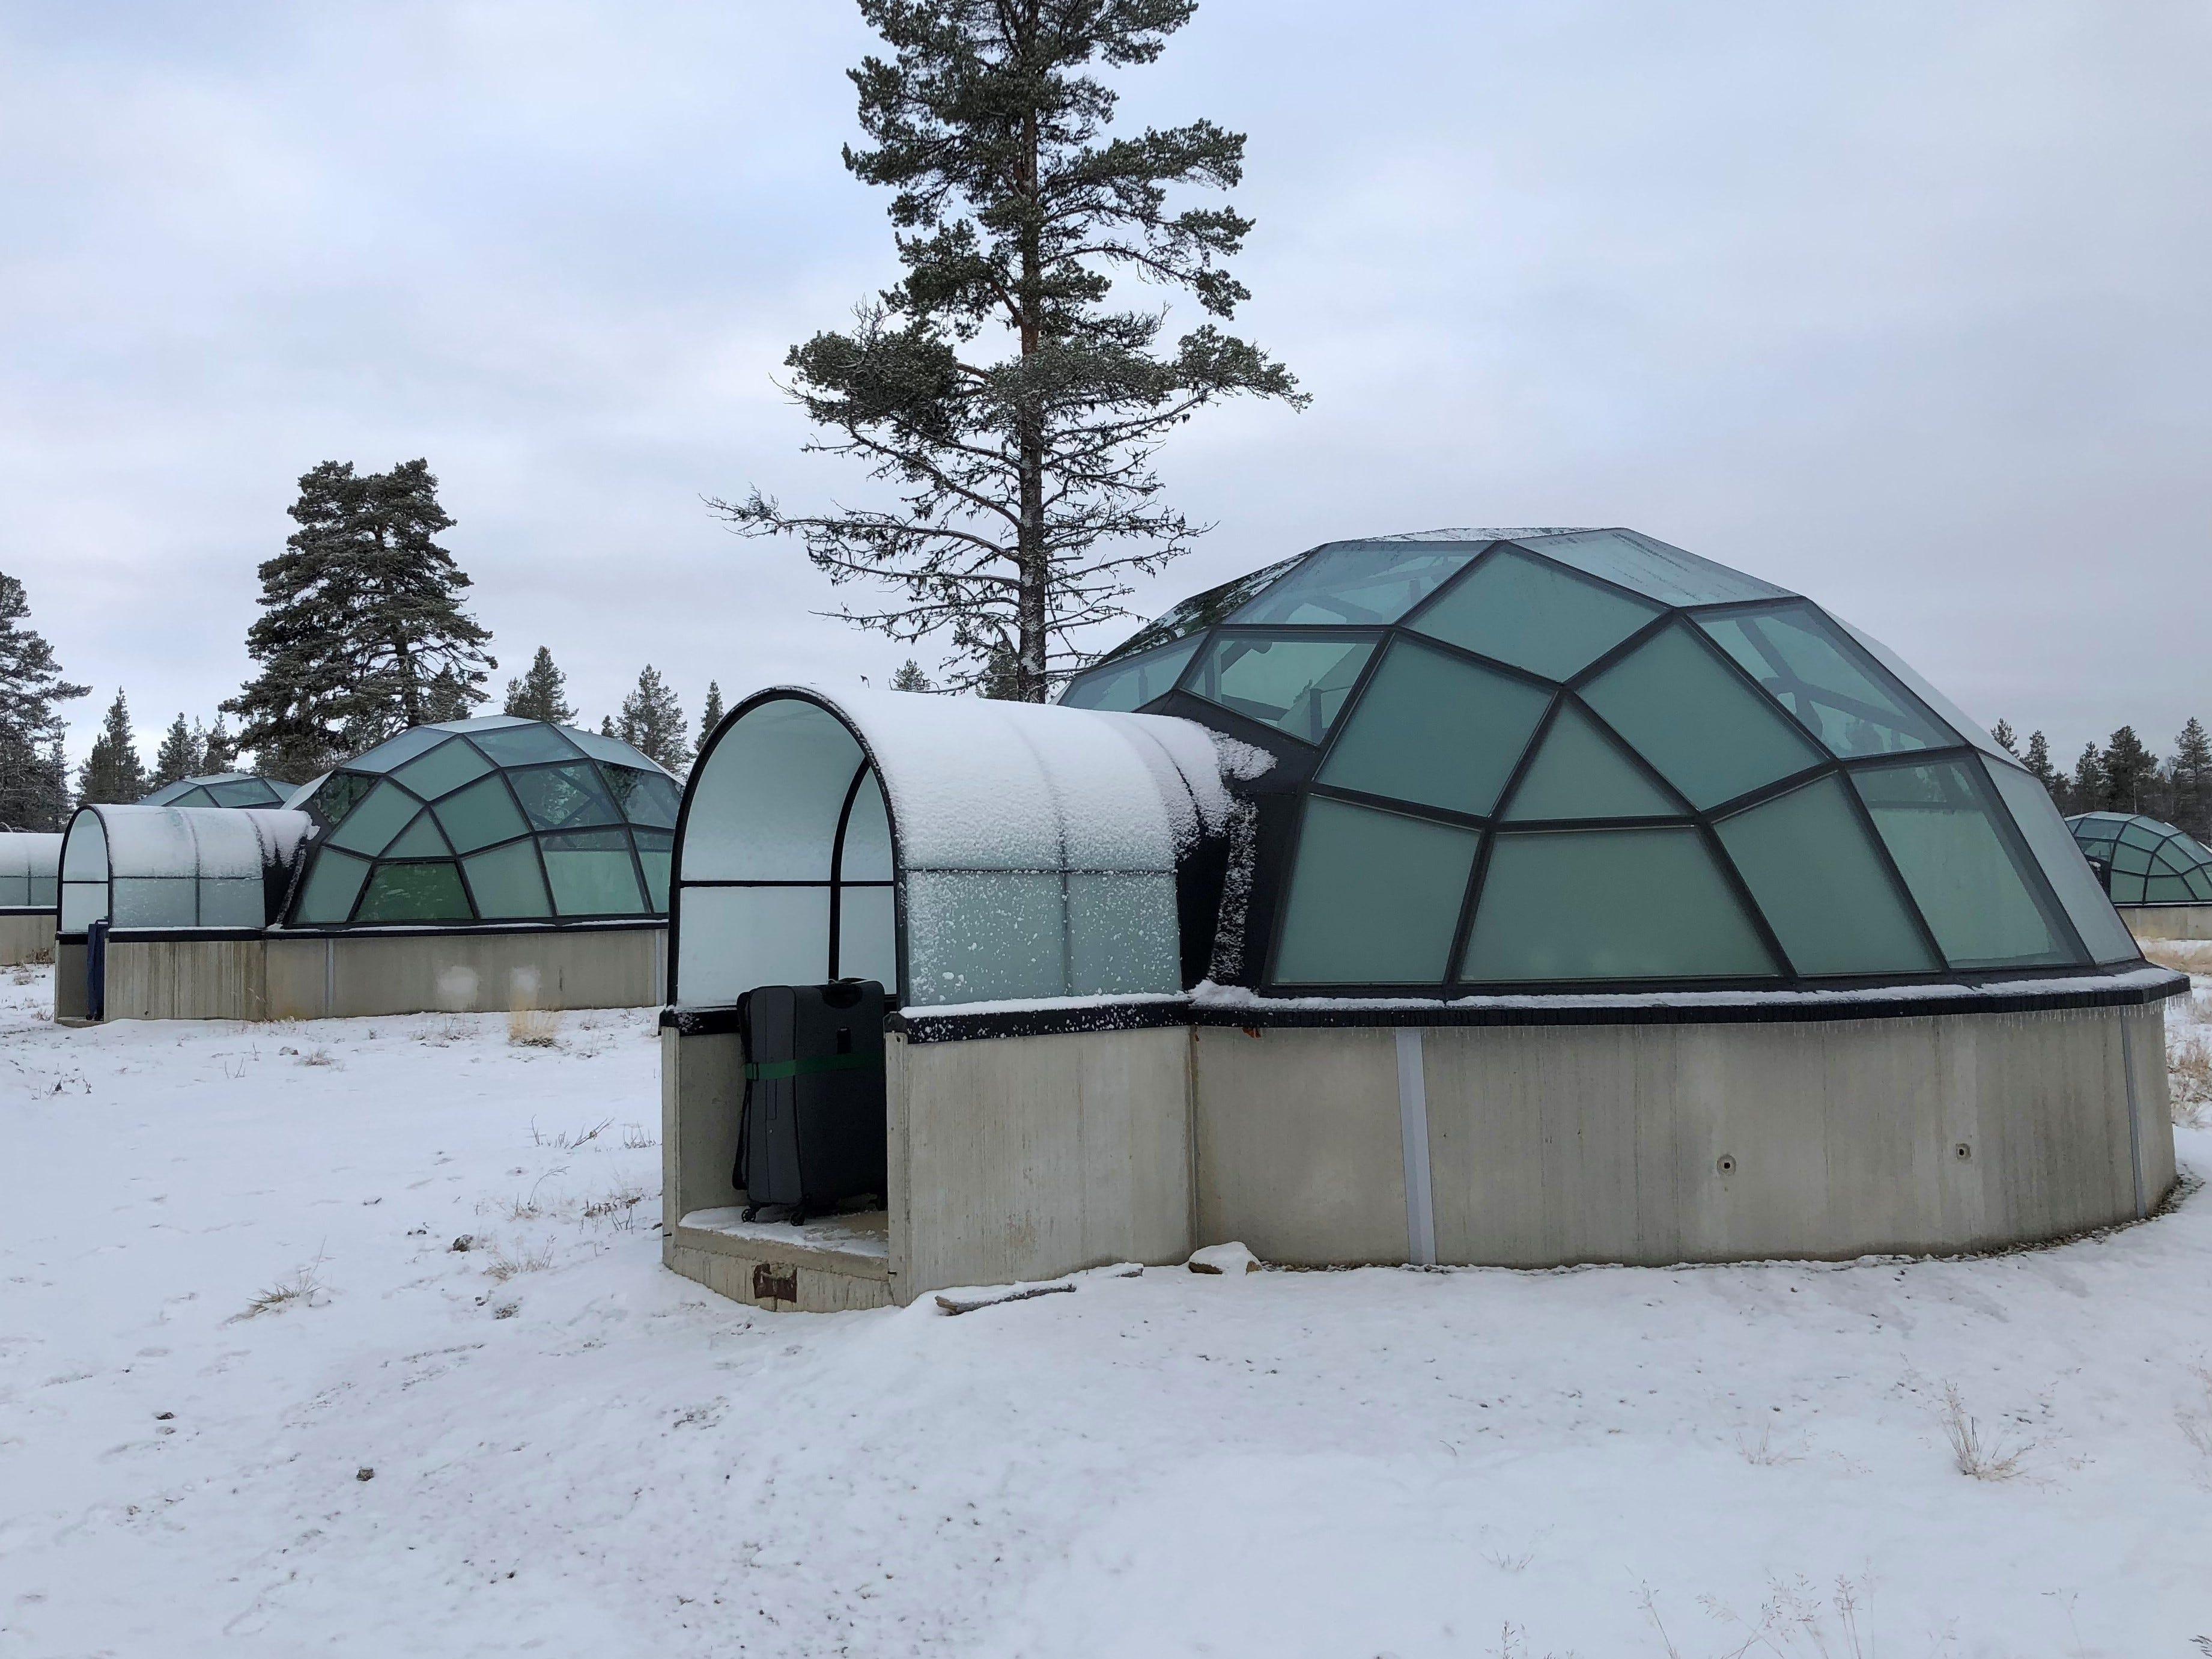 Accommodations for Ed McKenna at the  Kakslauttanen Arctic Resort.